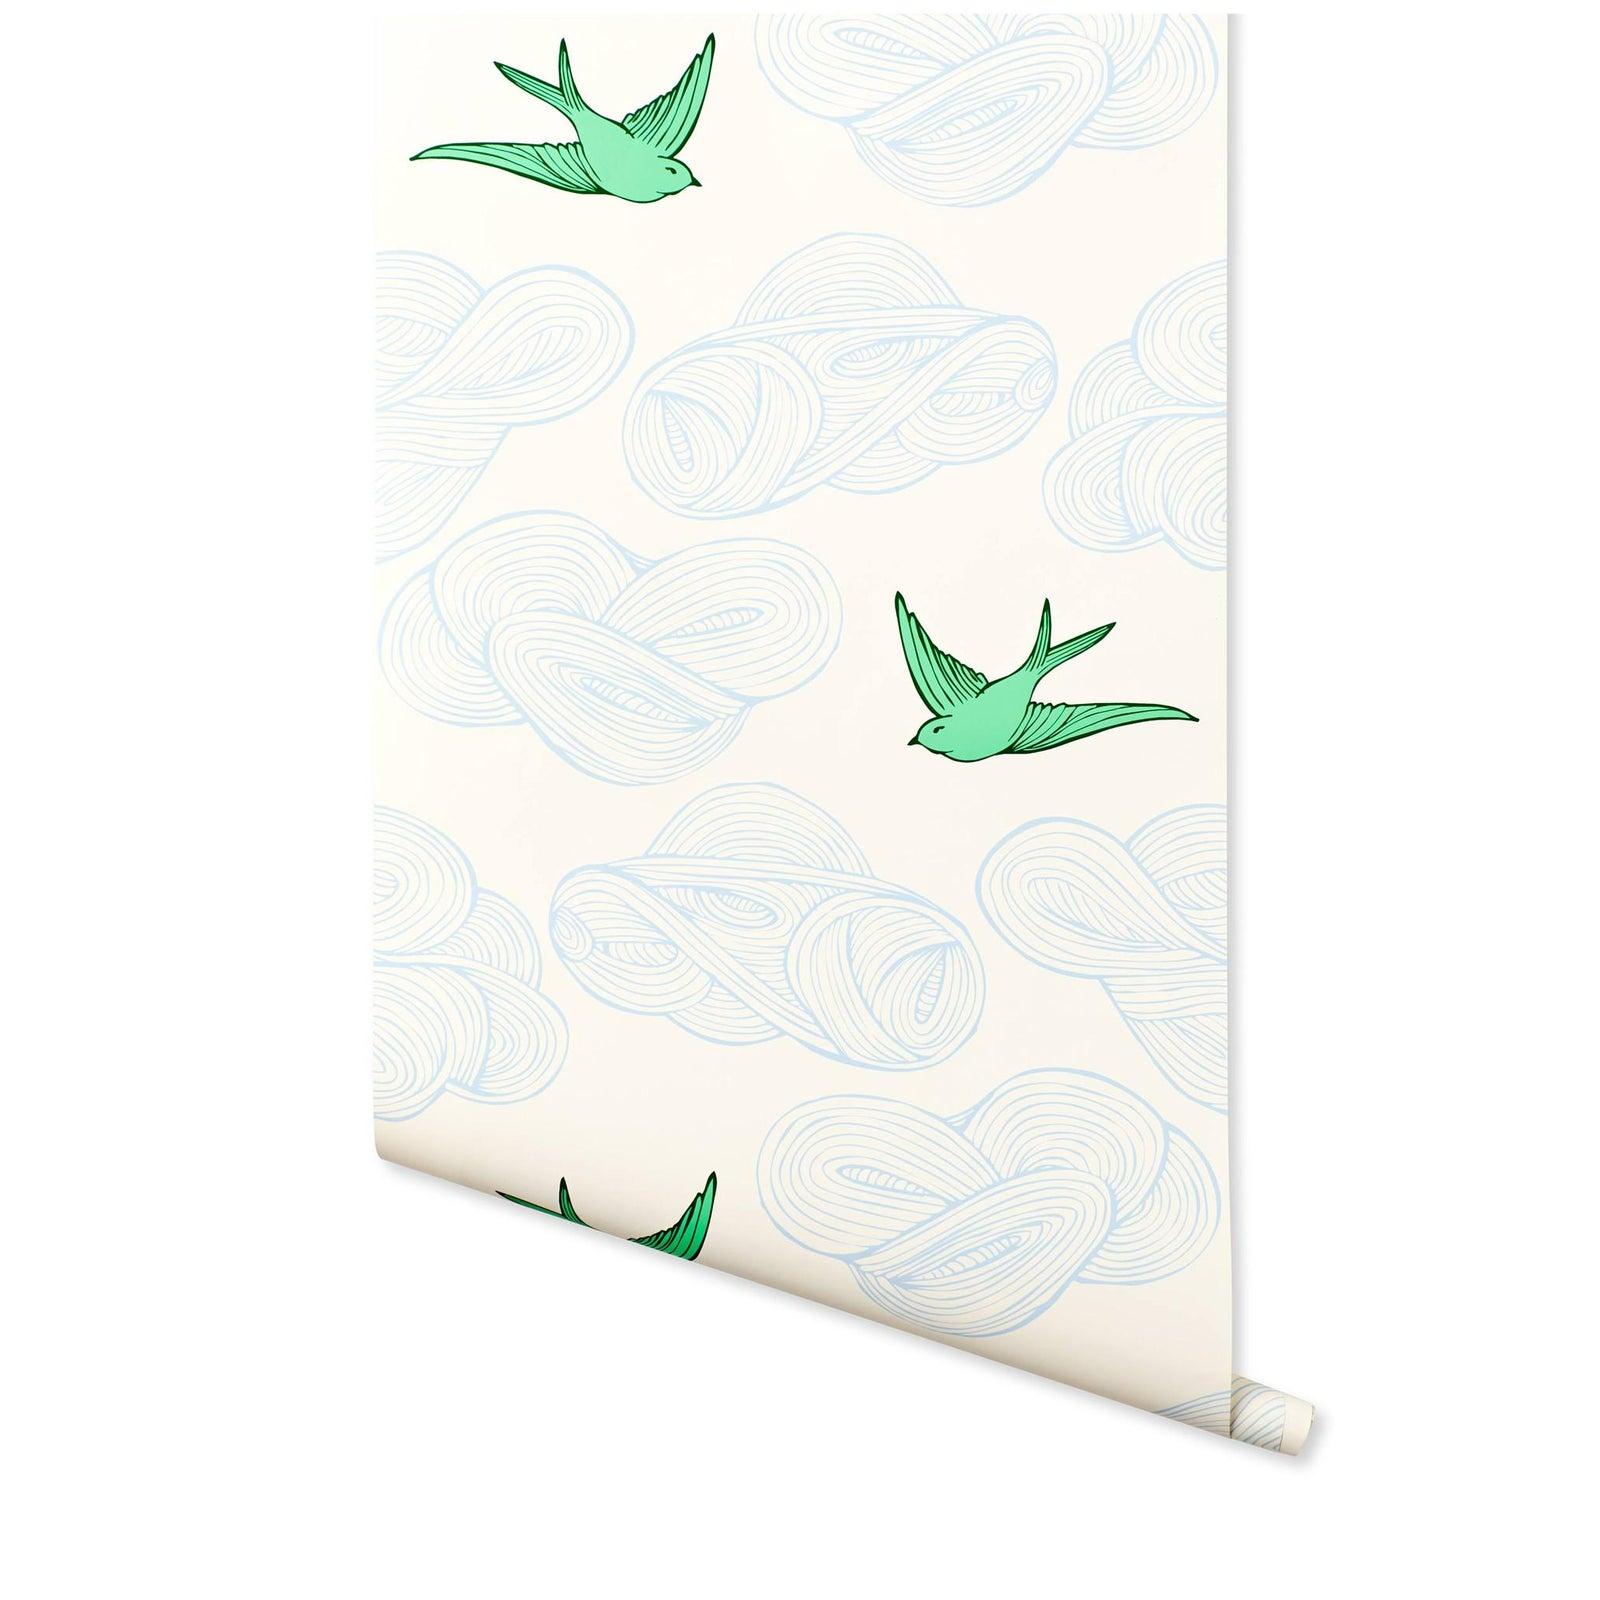 Hygge & West Daydream Wallpaper in Green - 1 Roll   Chairish